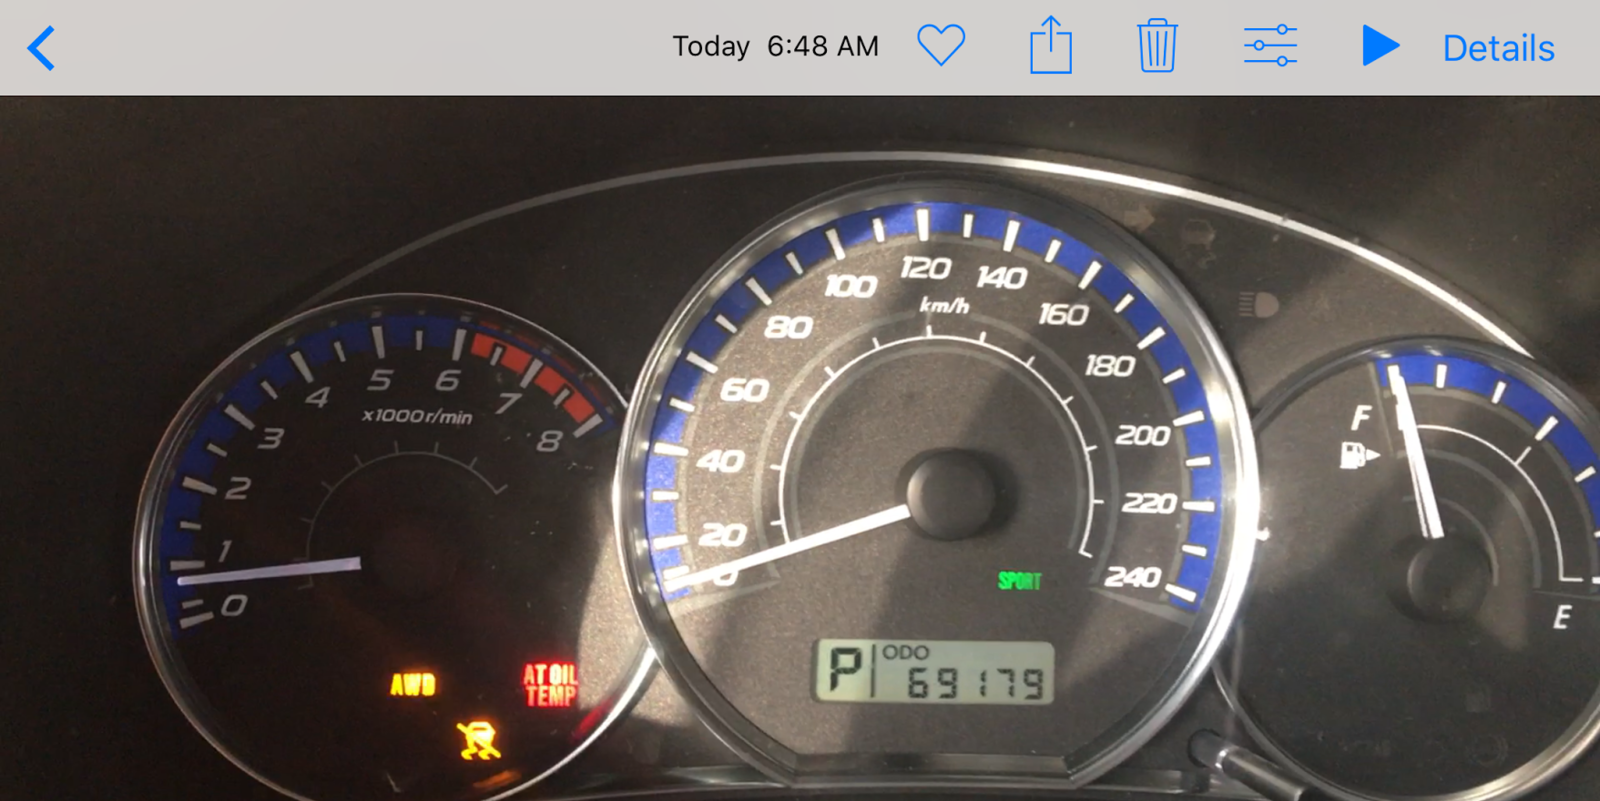 Subaru Forester All Warning Lights On Shelly Lighting